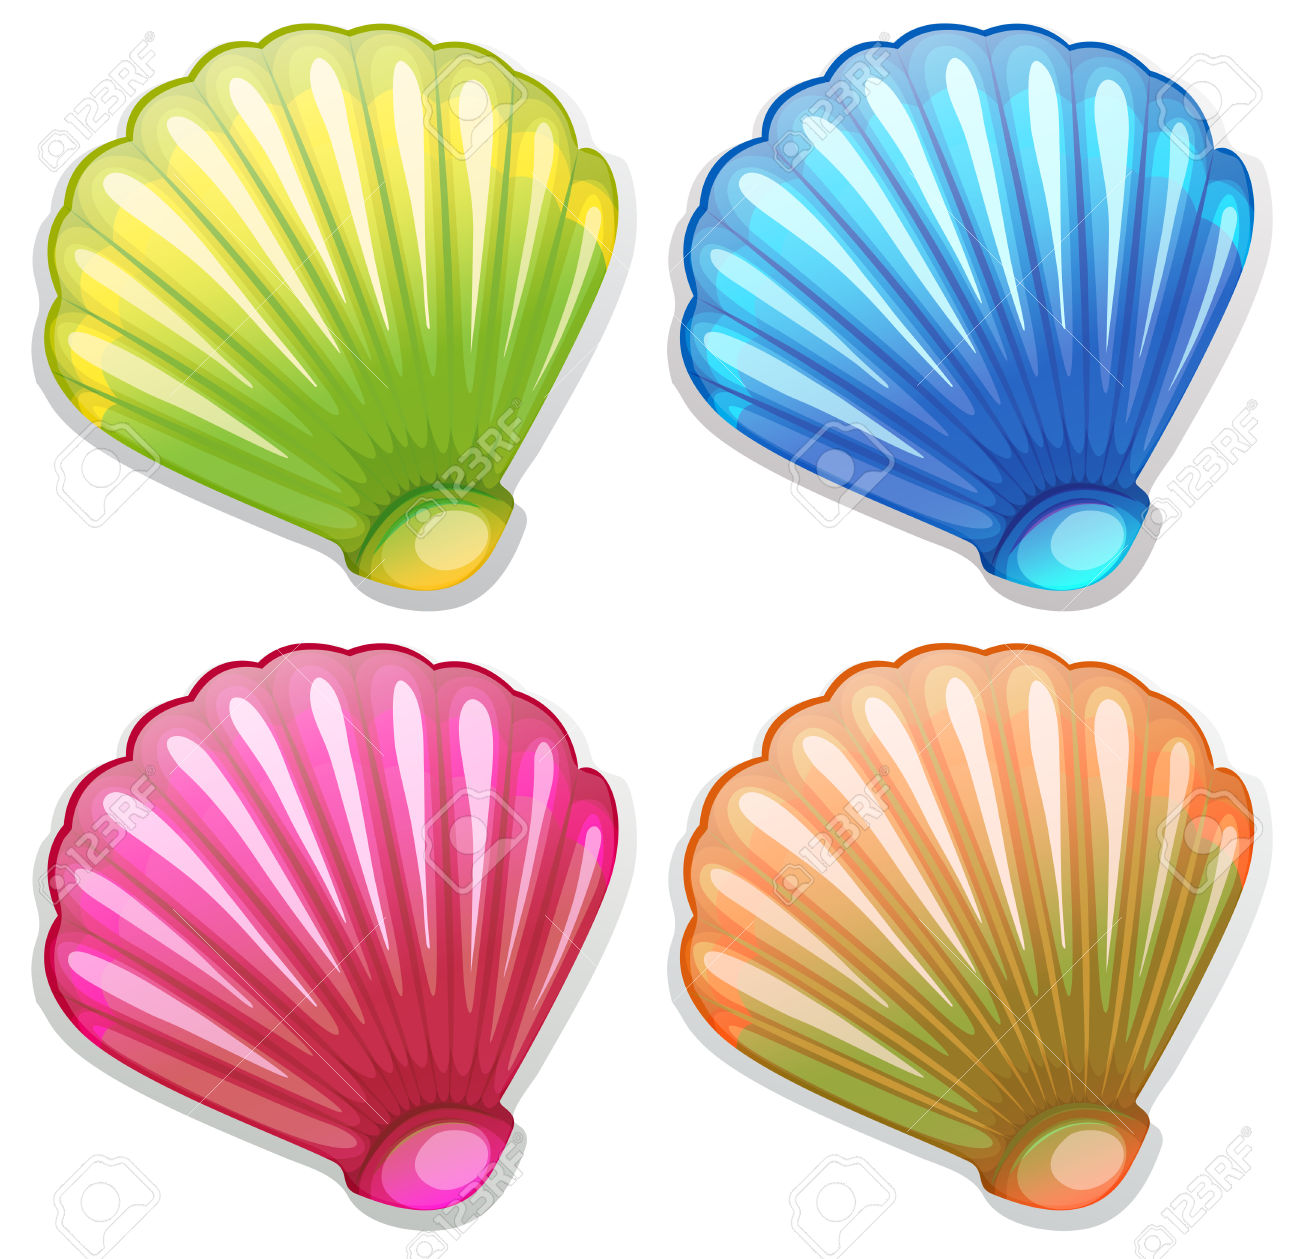 Seashell images clip art.